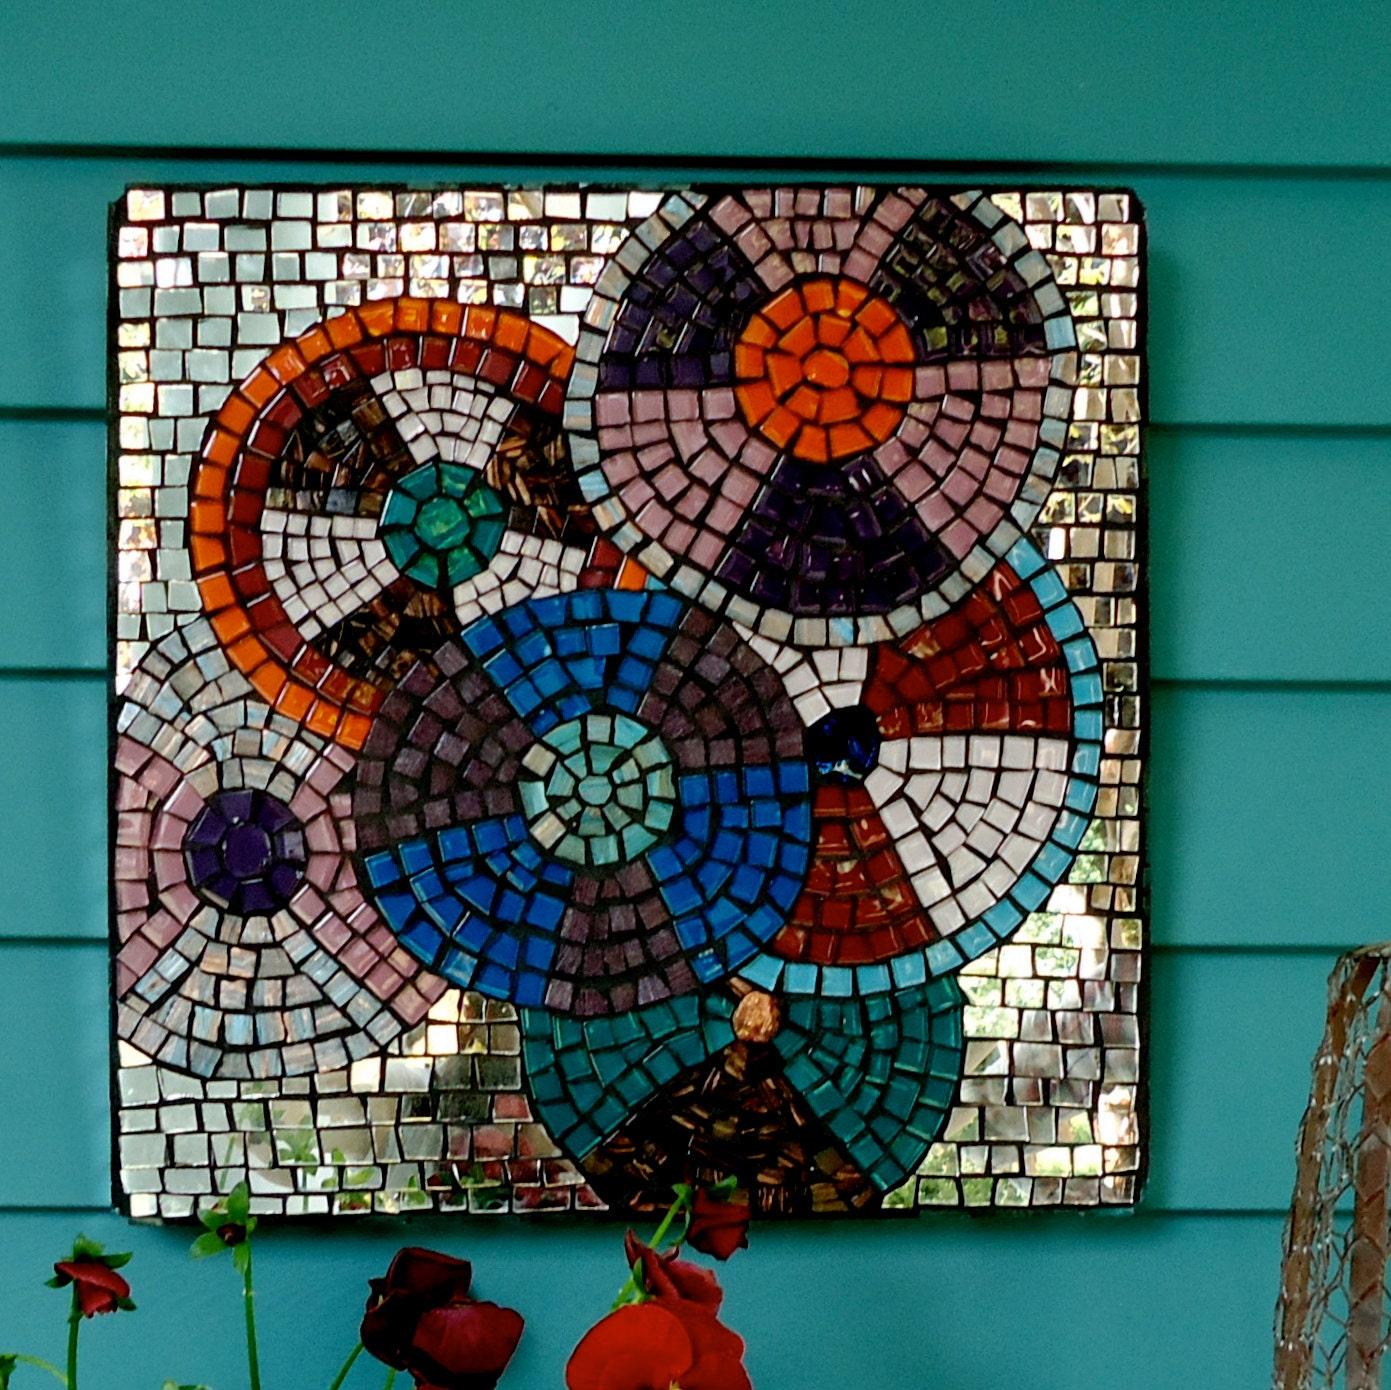 Circular ceramic tiles